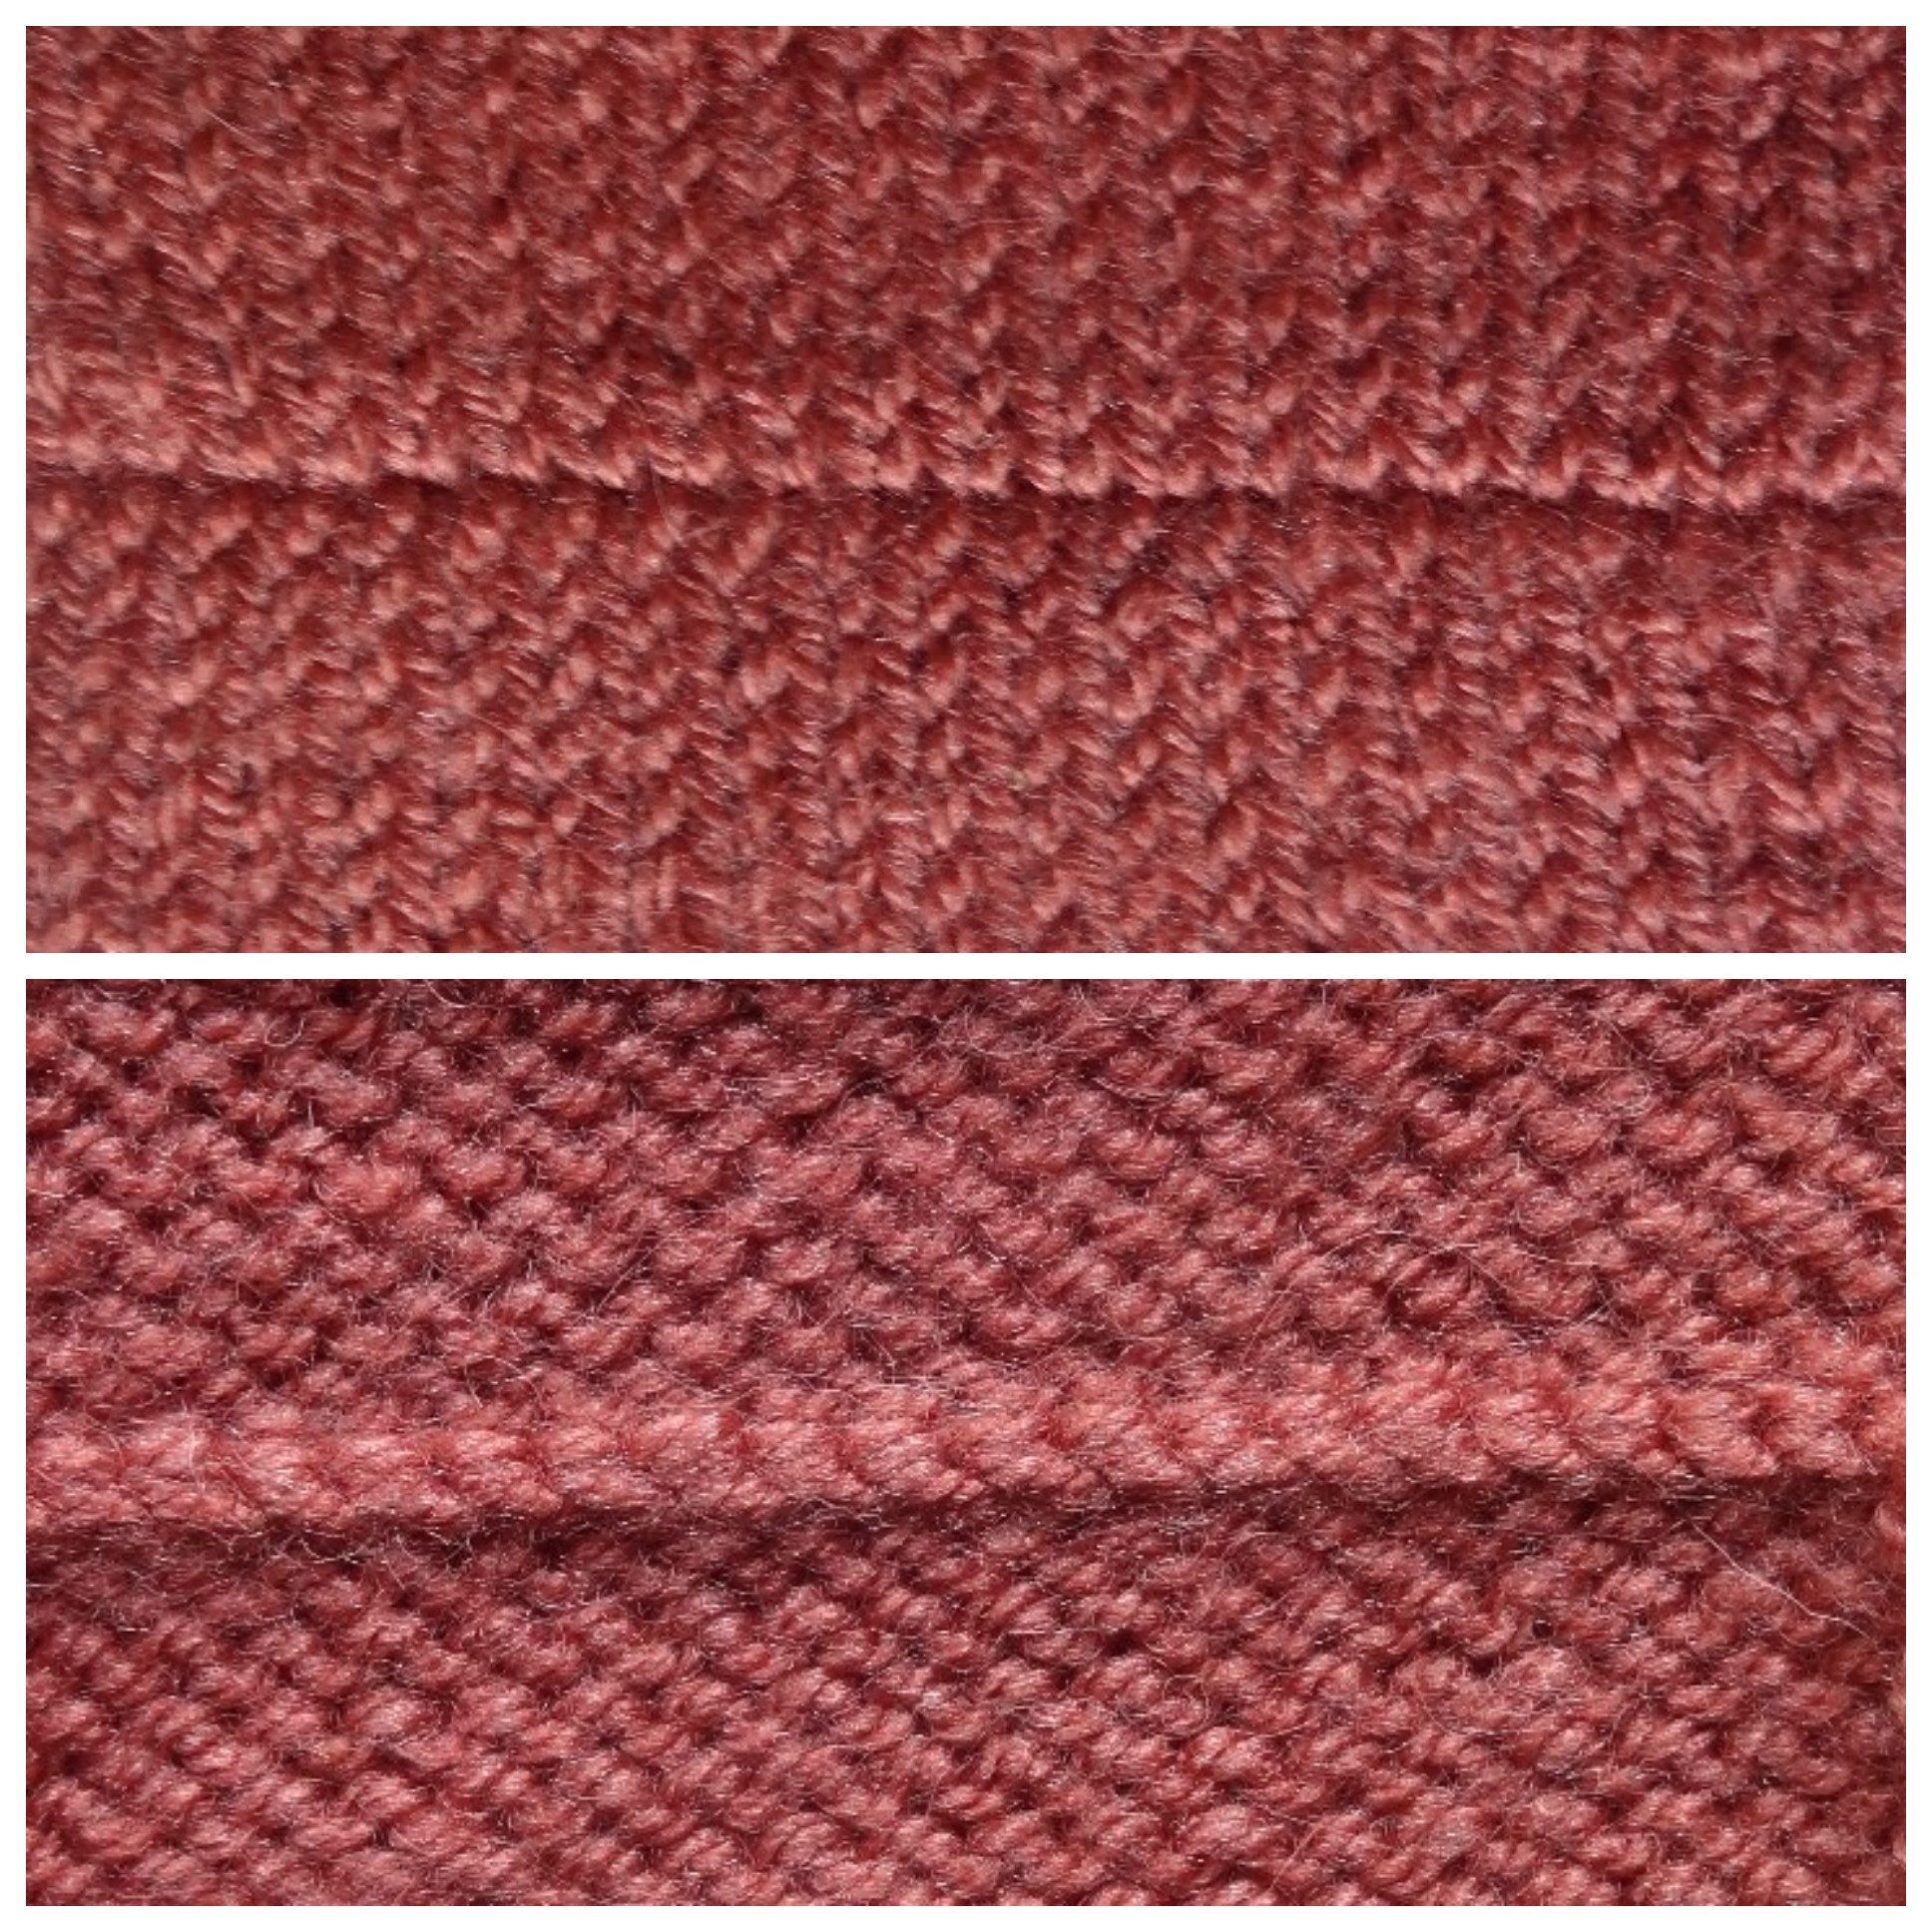 C&G Hand Knit Textiles